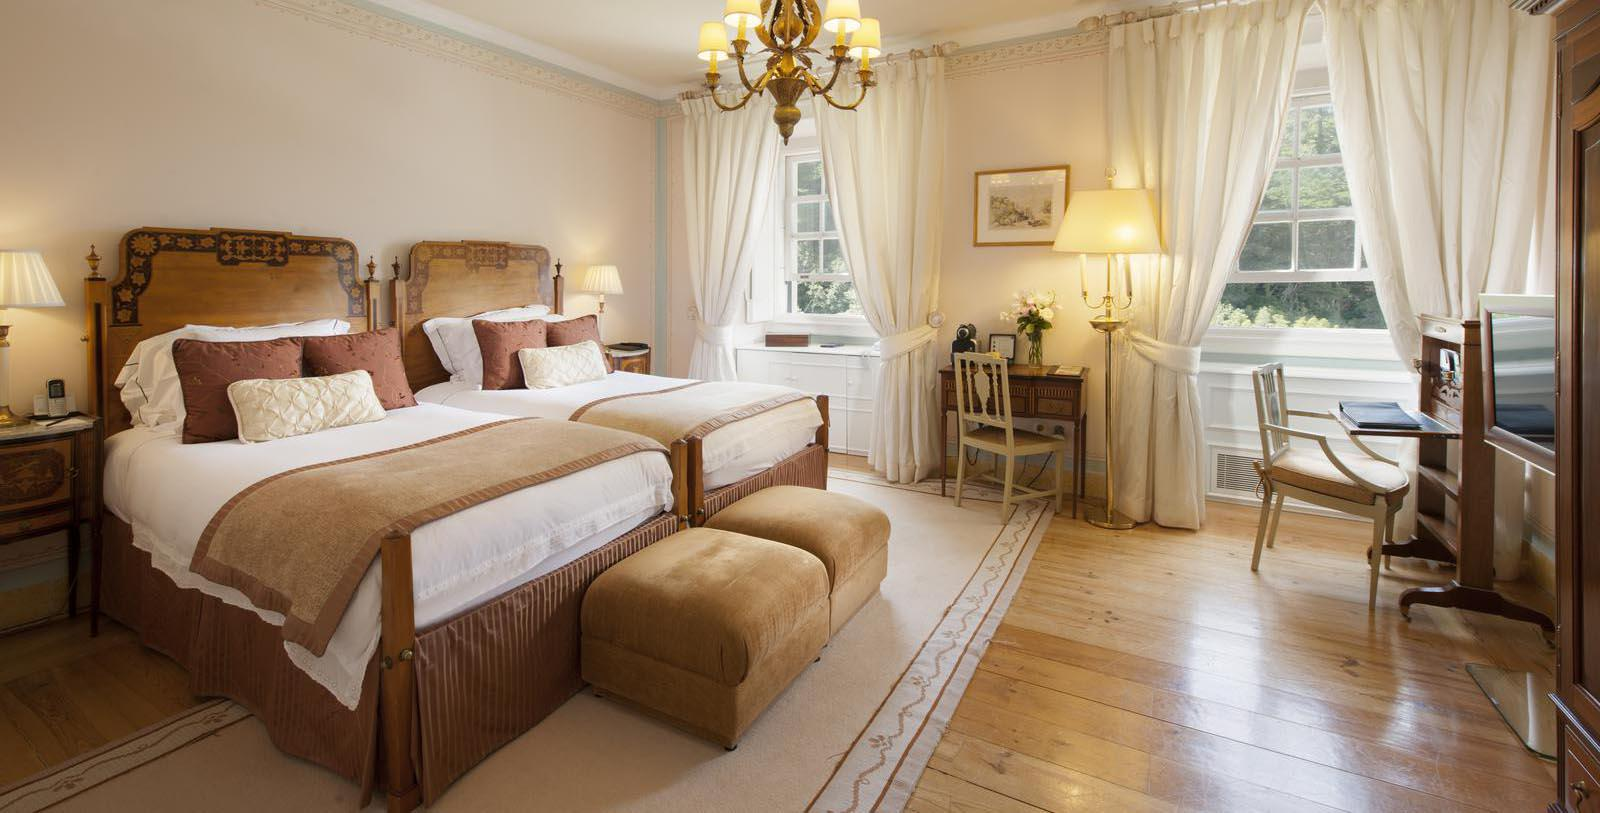 Image of Guestroom at Tivoli Palacio de Seteais, 1787, Member of Historic Hotels Worldwide, in Sintra, Portugal, Accommodations